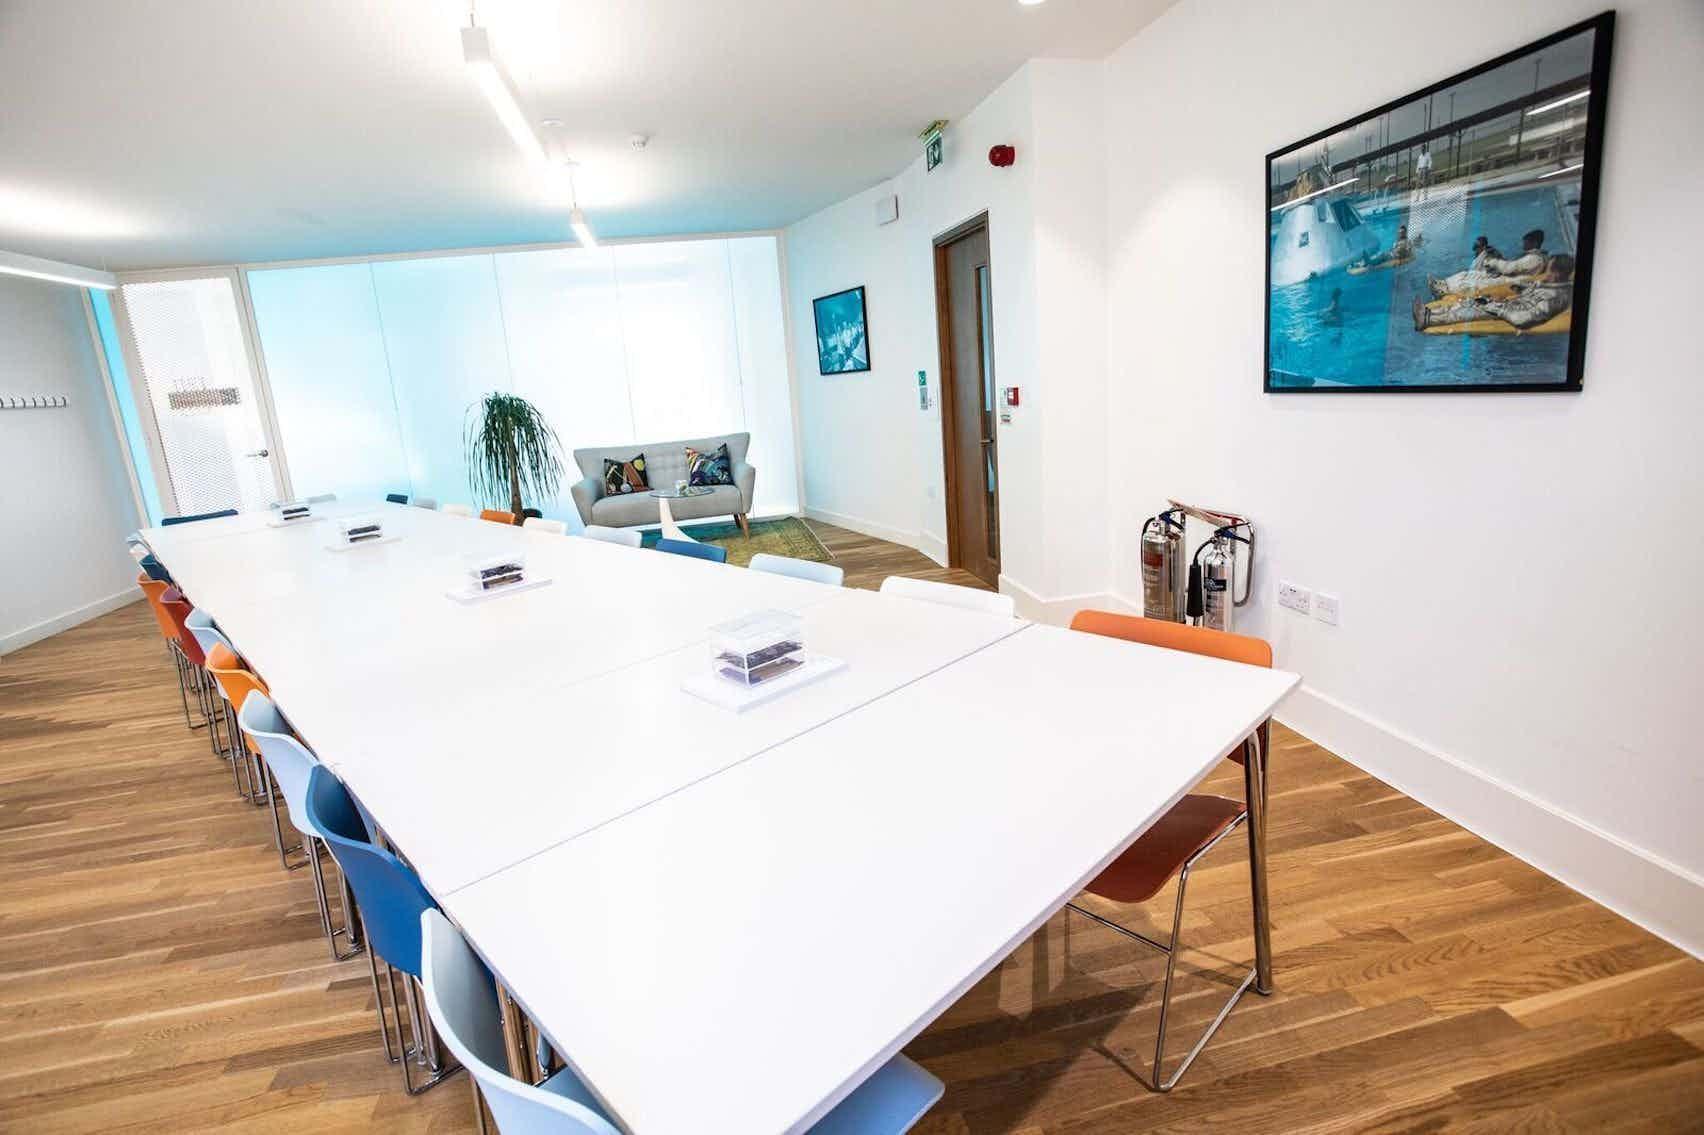 Gagarin Room, wallacespace Spitalfields